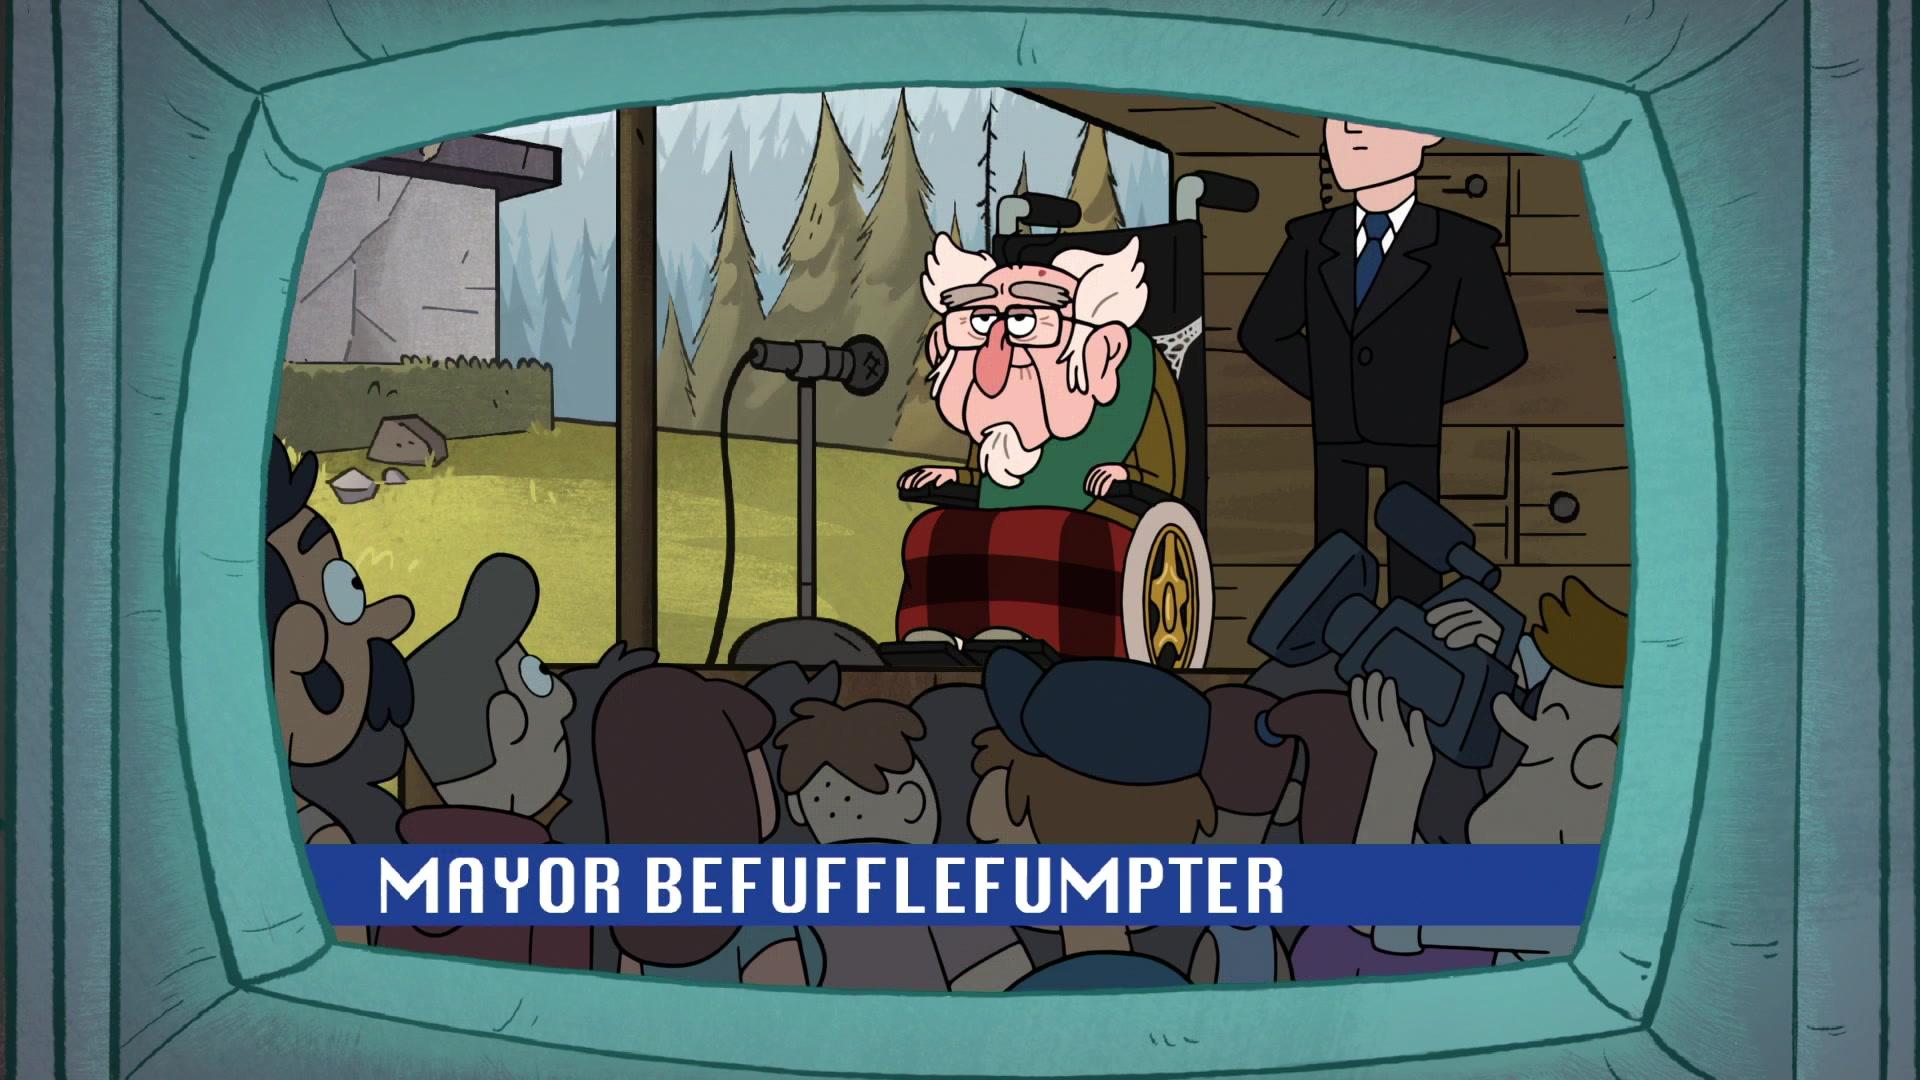 Alcalde Befufflefumpter